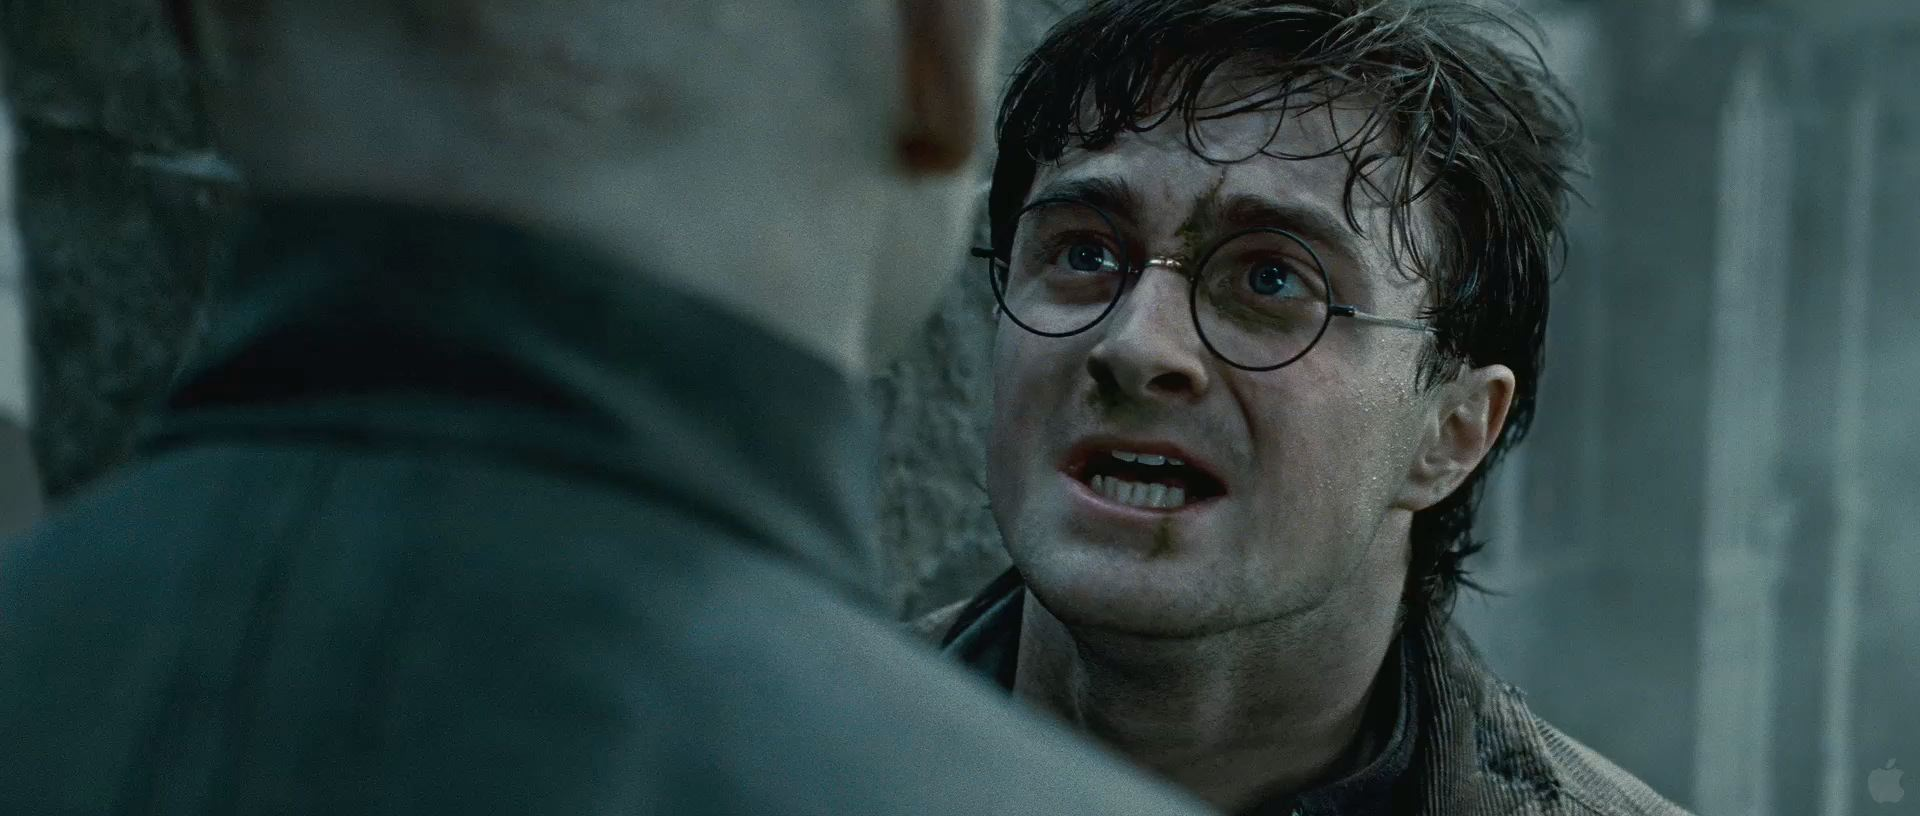 Harry Potter BlogHogwarts HP7 2 Trailer 59